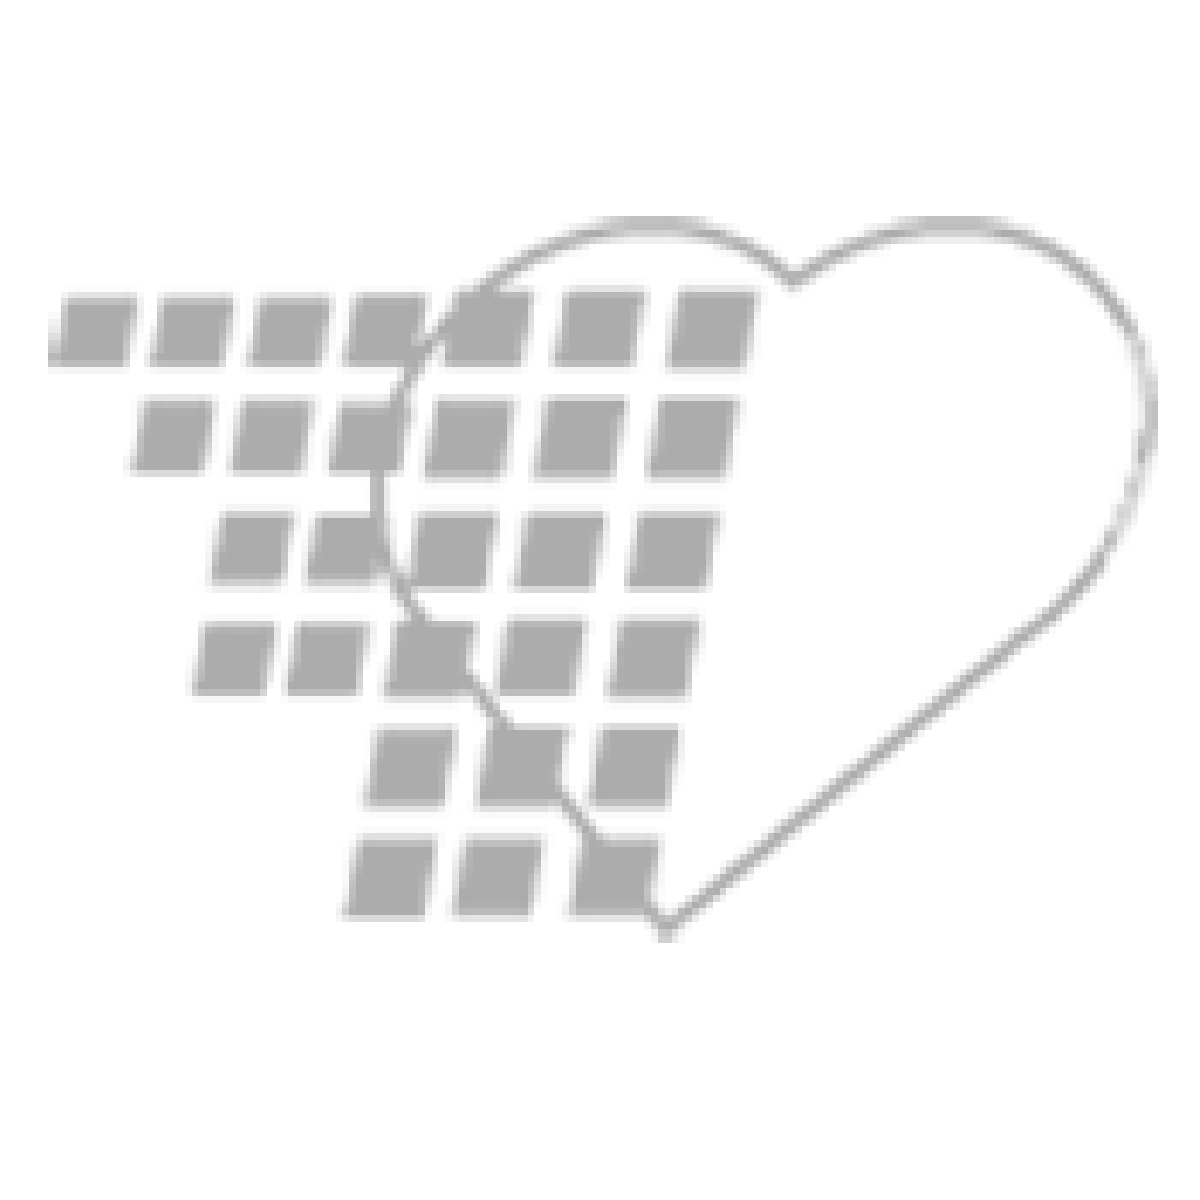 06-82-0111 - Monoject   Needleless Med Prep Cannula